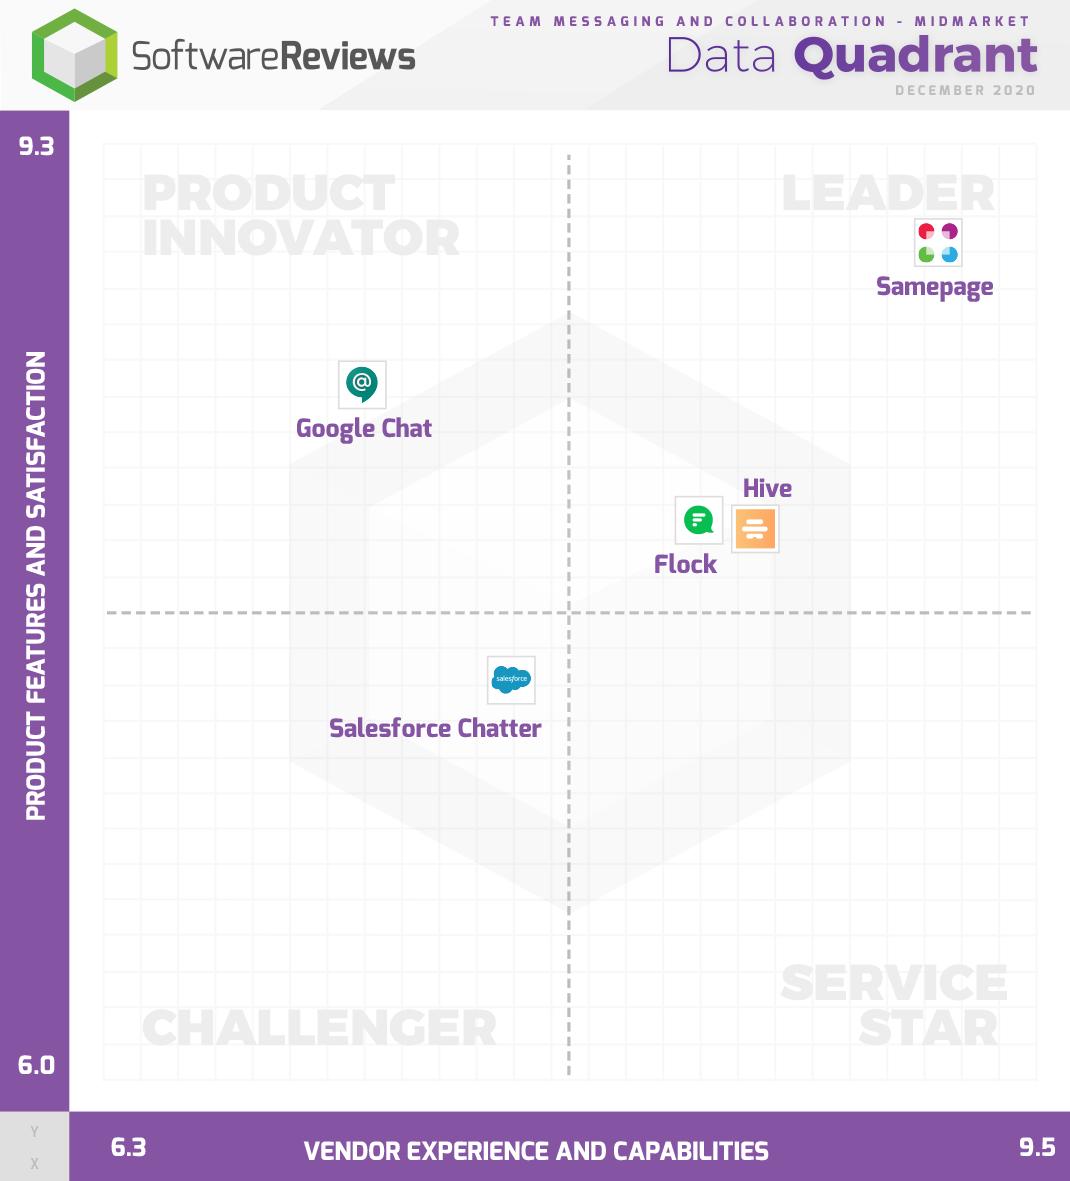 Team Messaging and Collaboration - Midmarket Data Quadrant